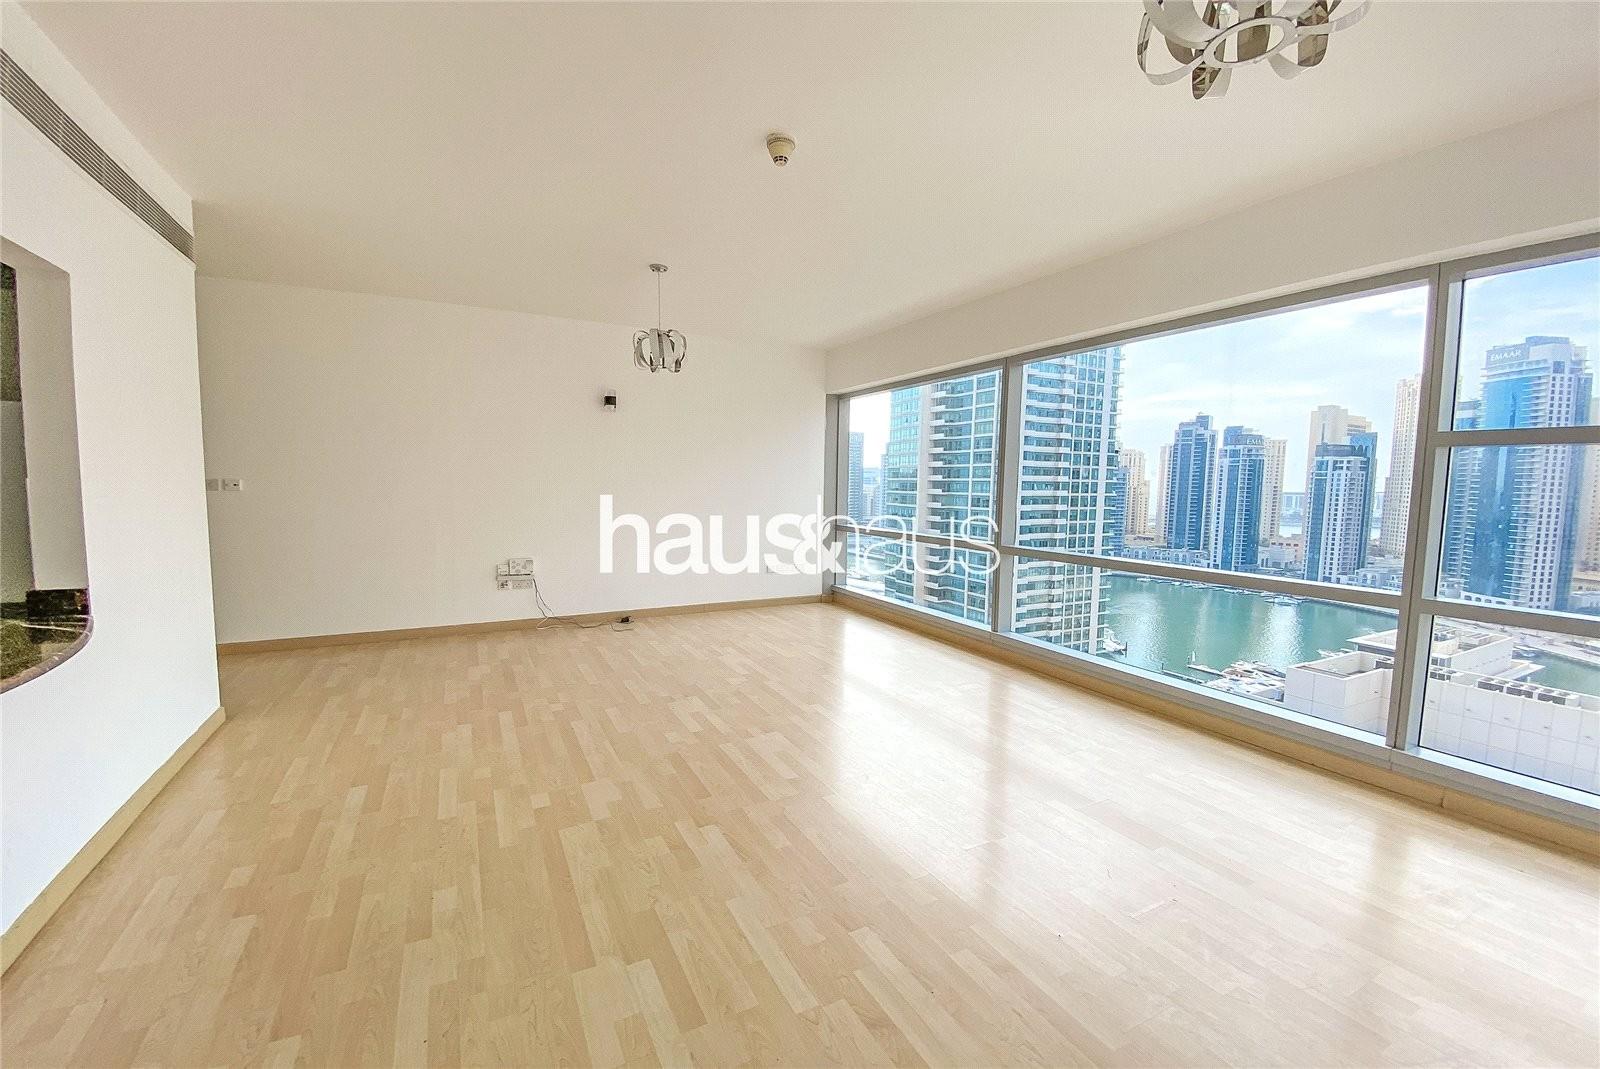 3 Bed | Maids | Marina Views | High Floor